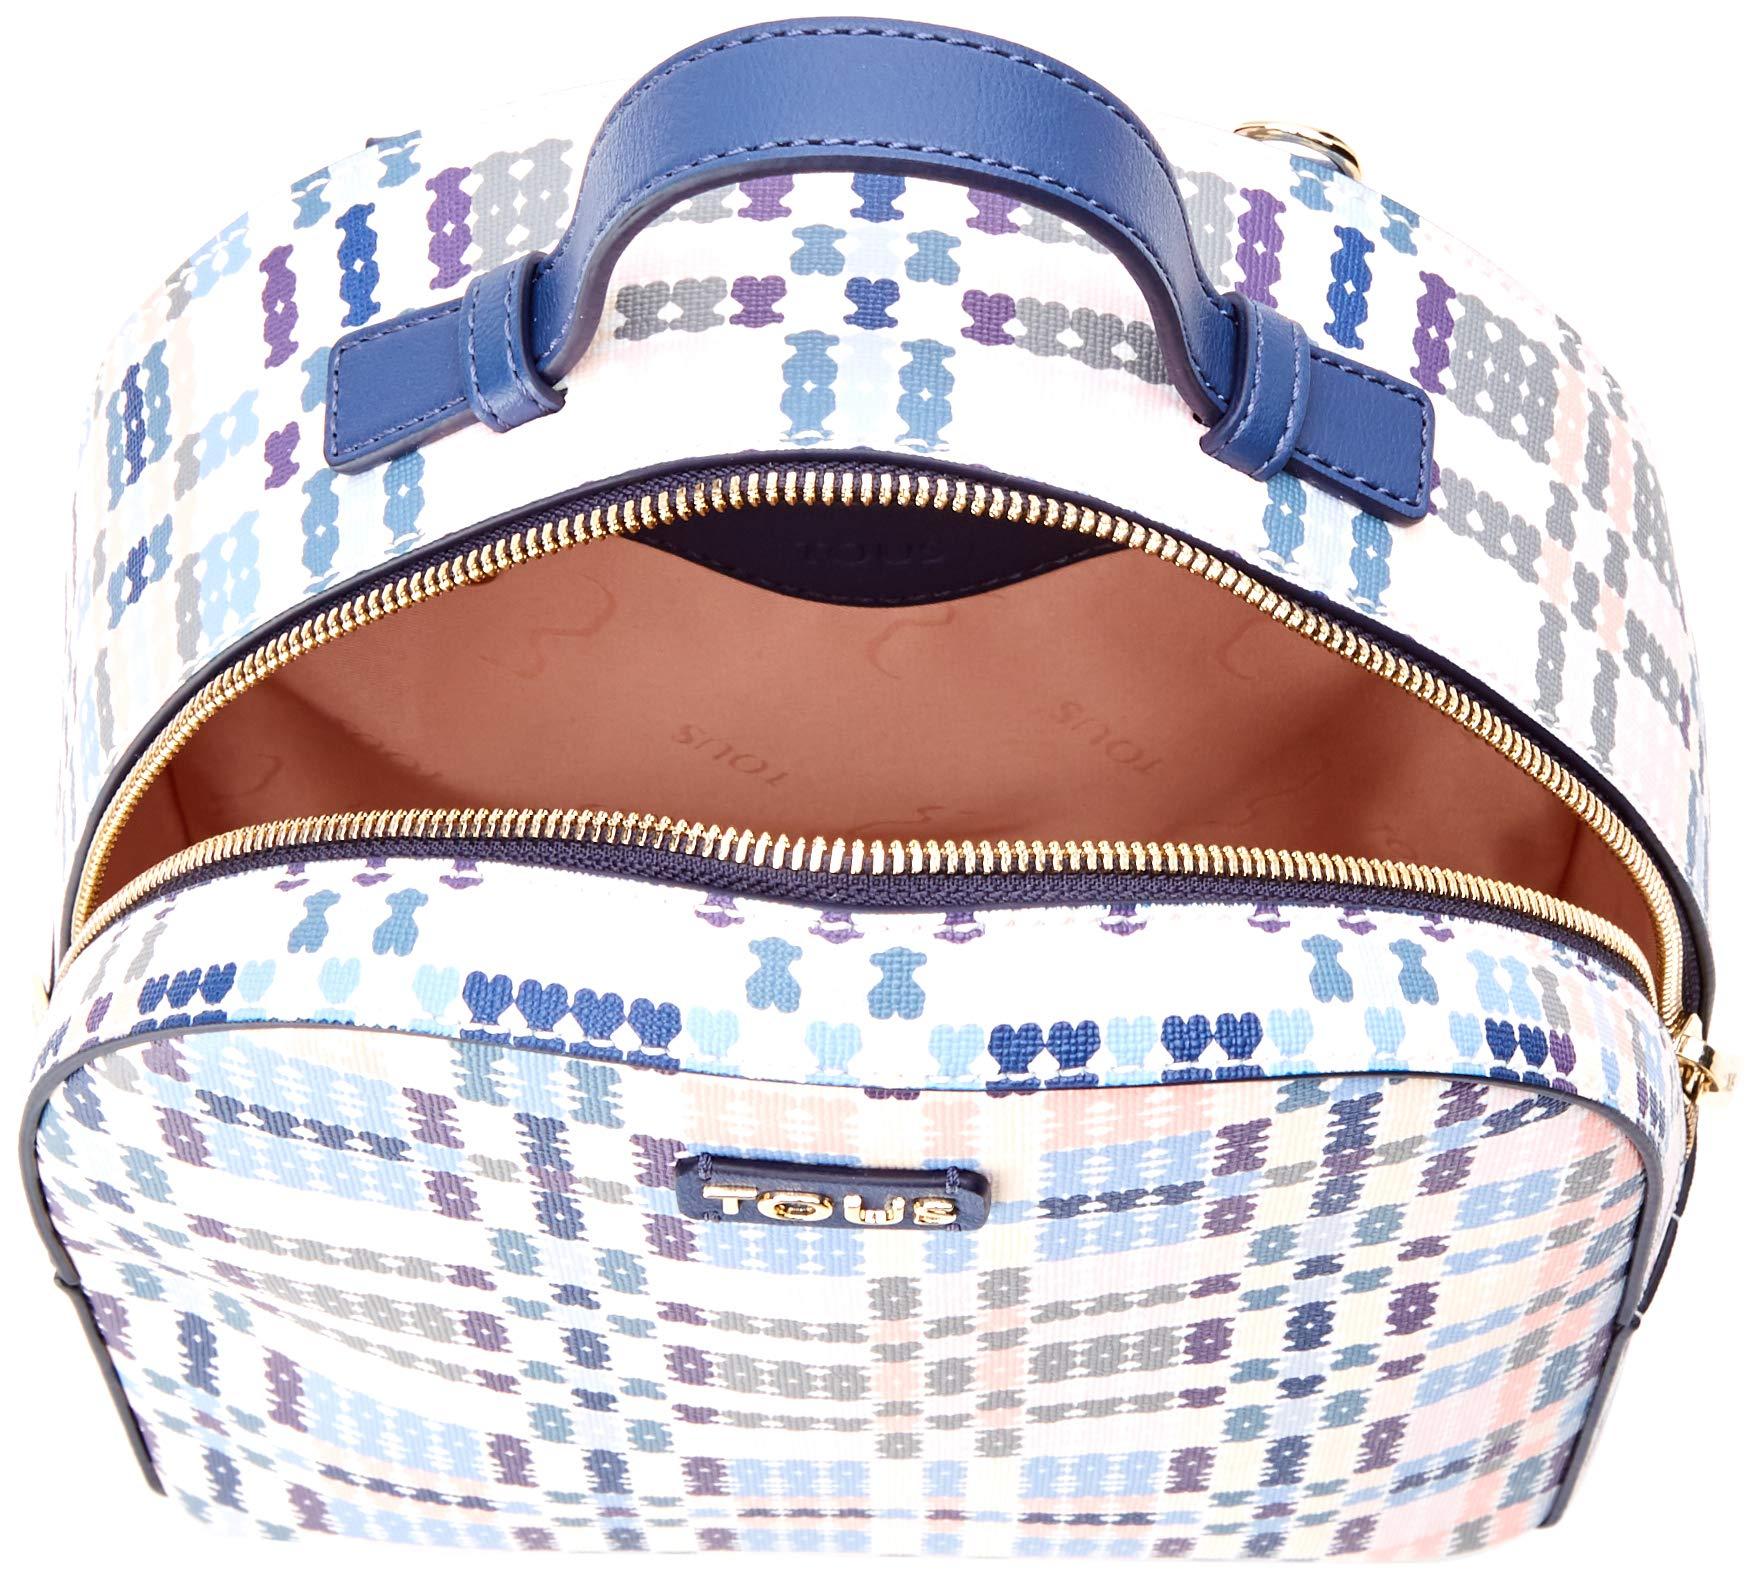 81aeBr QOXL - Tous 995800183, Bolso mochila para Mujer, Azul (Azul), 21x25x9 cm (W x H x L)